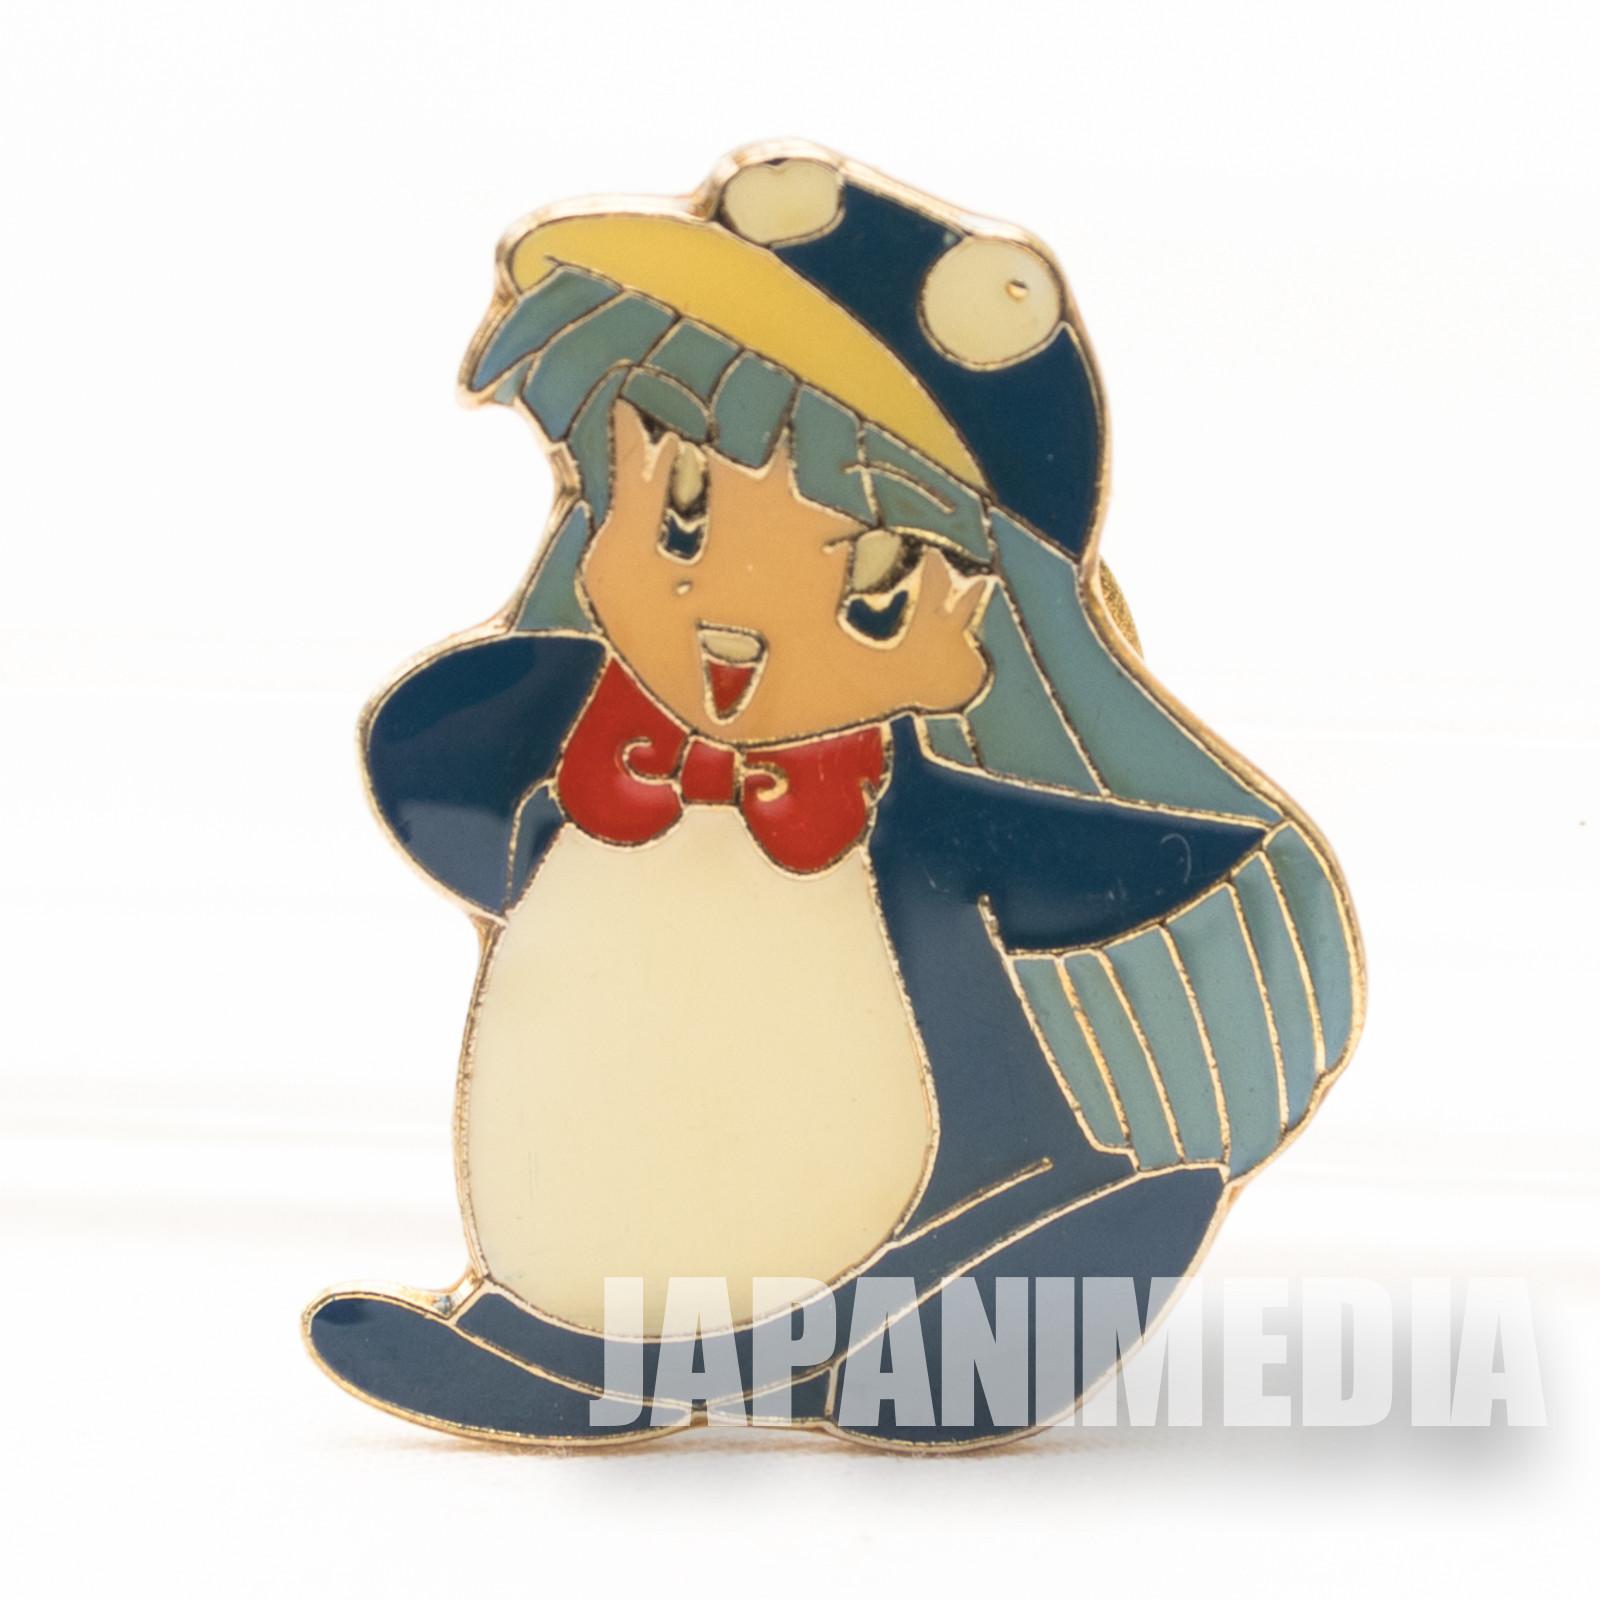 Magic Knight Rayearth Umi Ryuzaki Metal Pins Badge CLAMP JAPAN ANIME MANGA 3